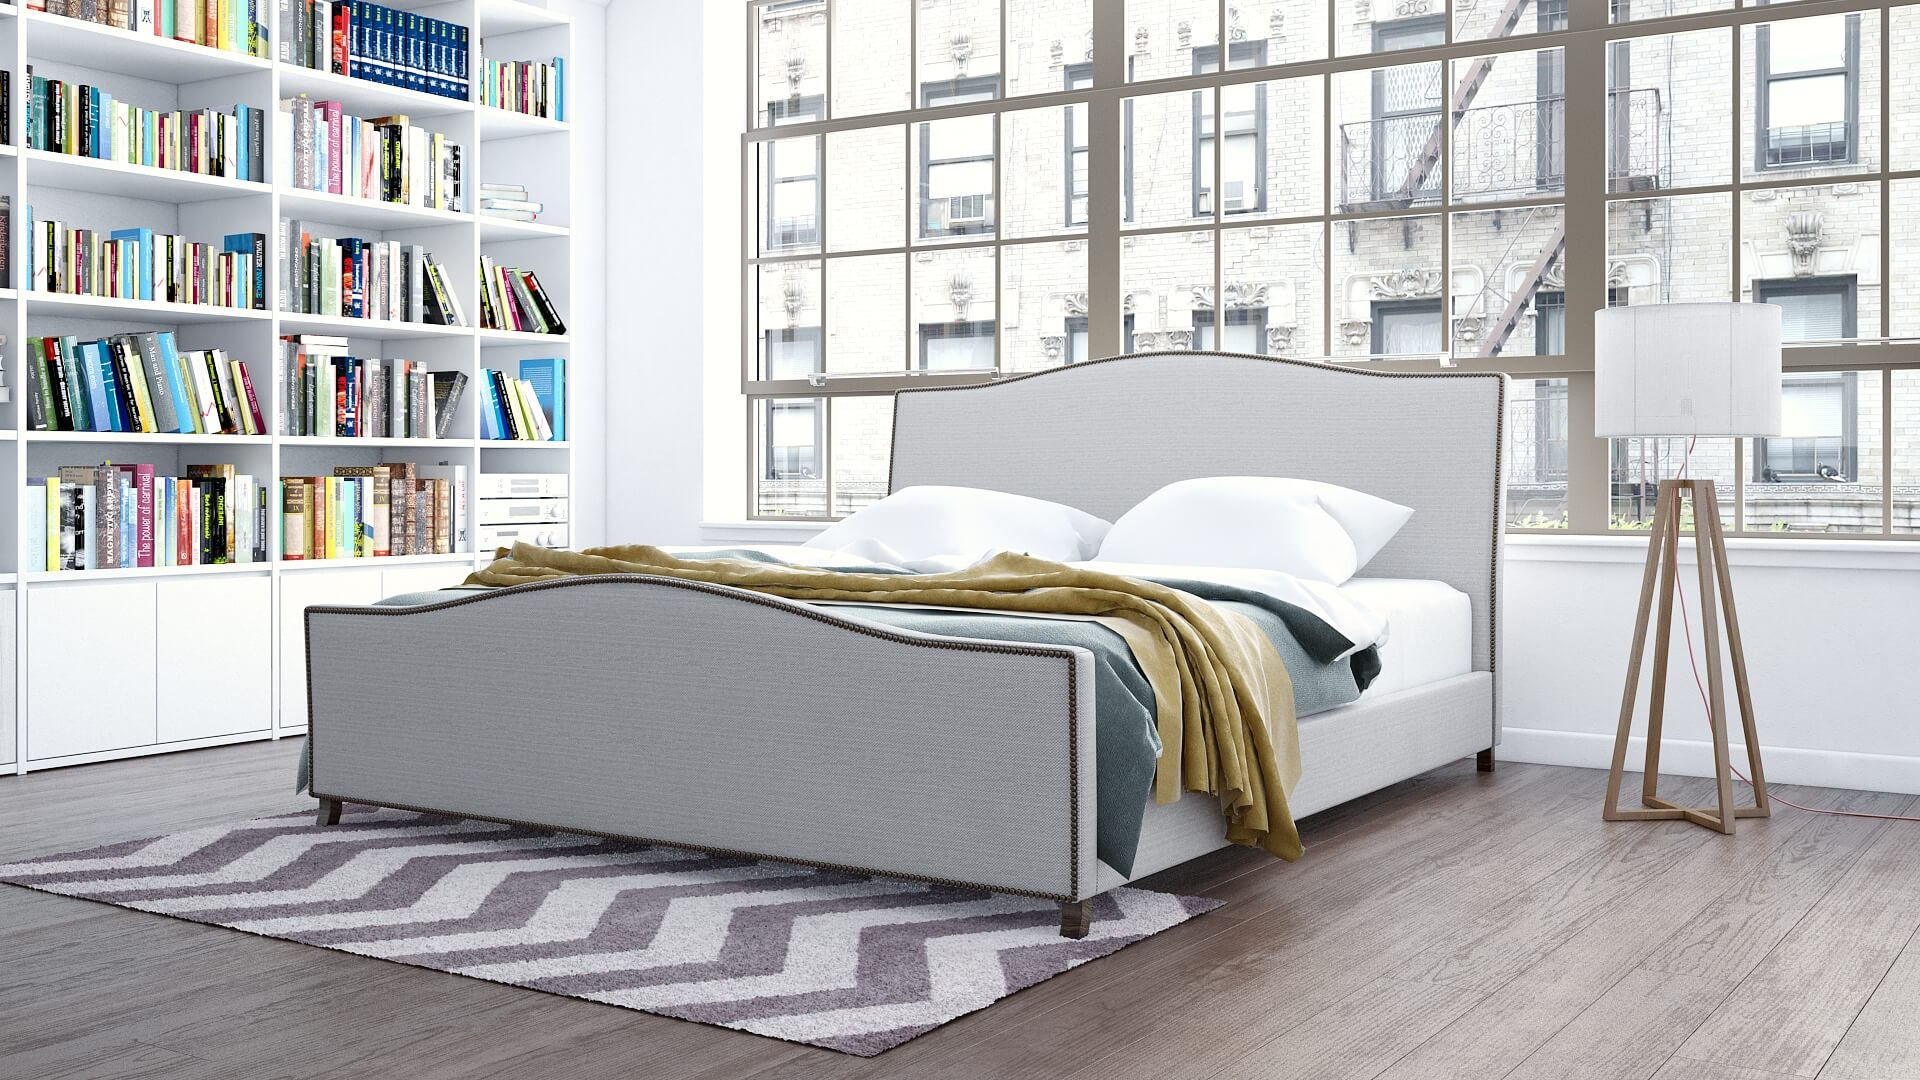 prato bed furniture gallery 1